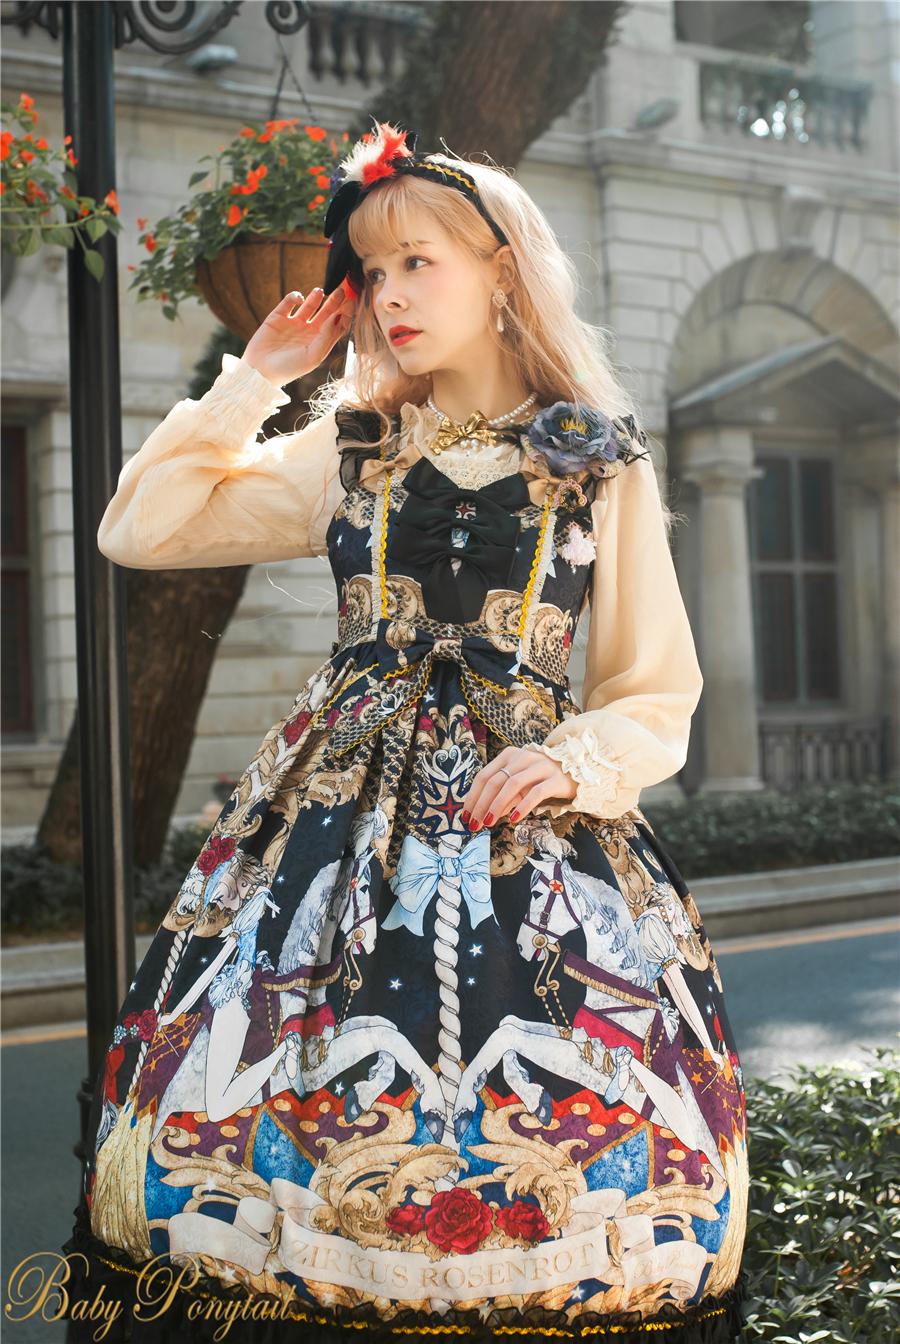 Baby Ponytail_Circus Princess_Black JSK_Claudia_15.jpg